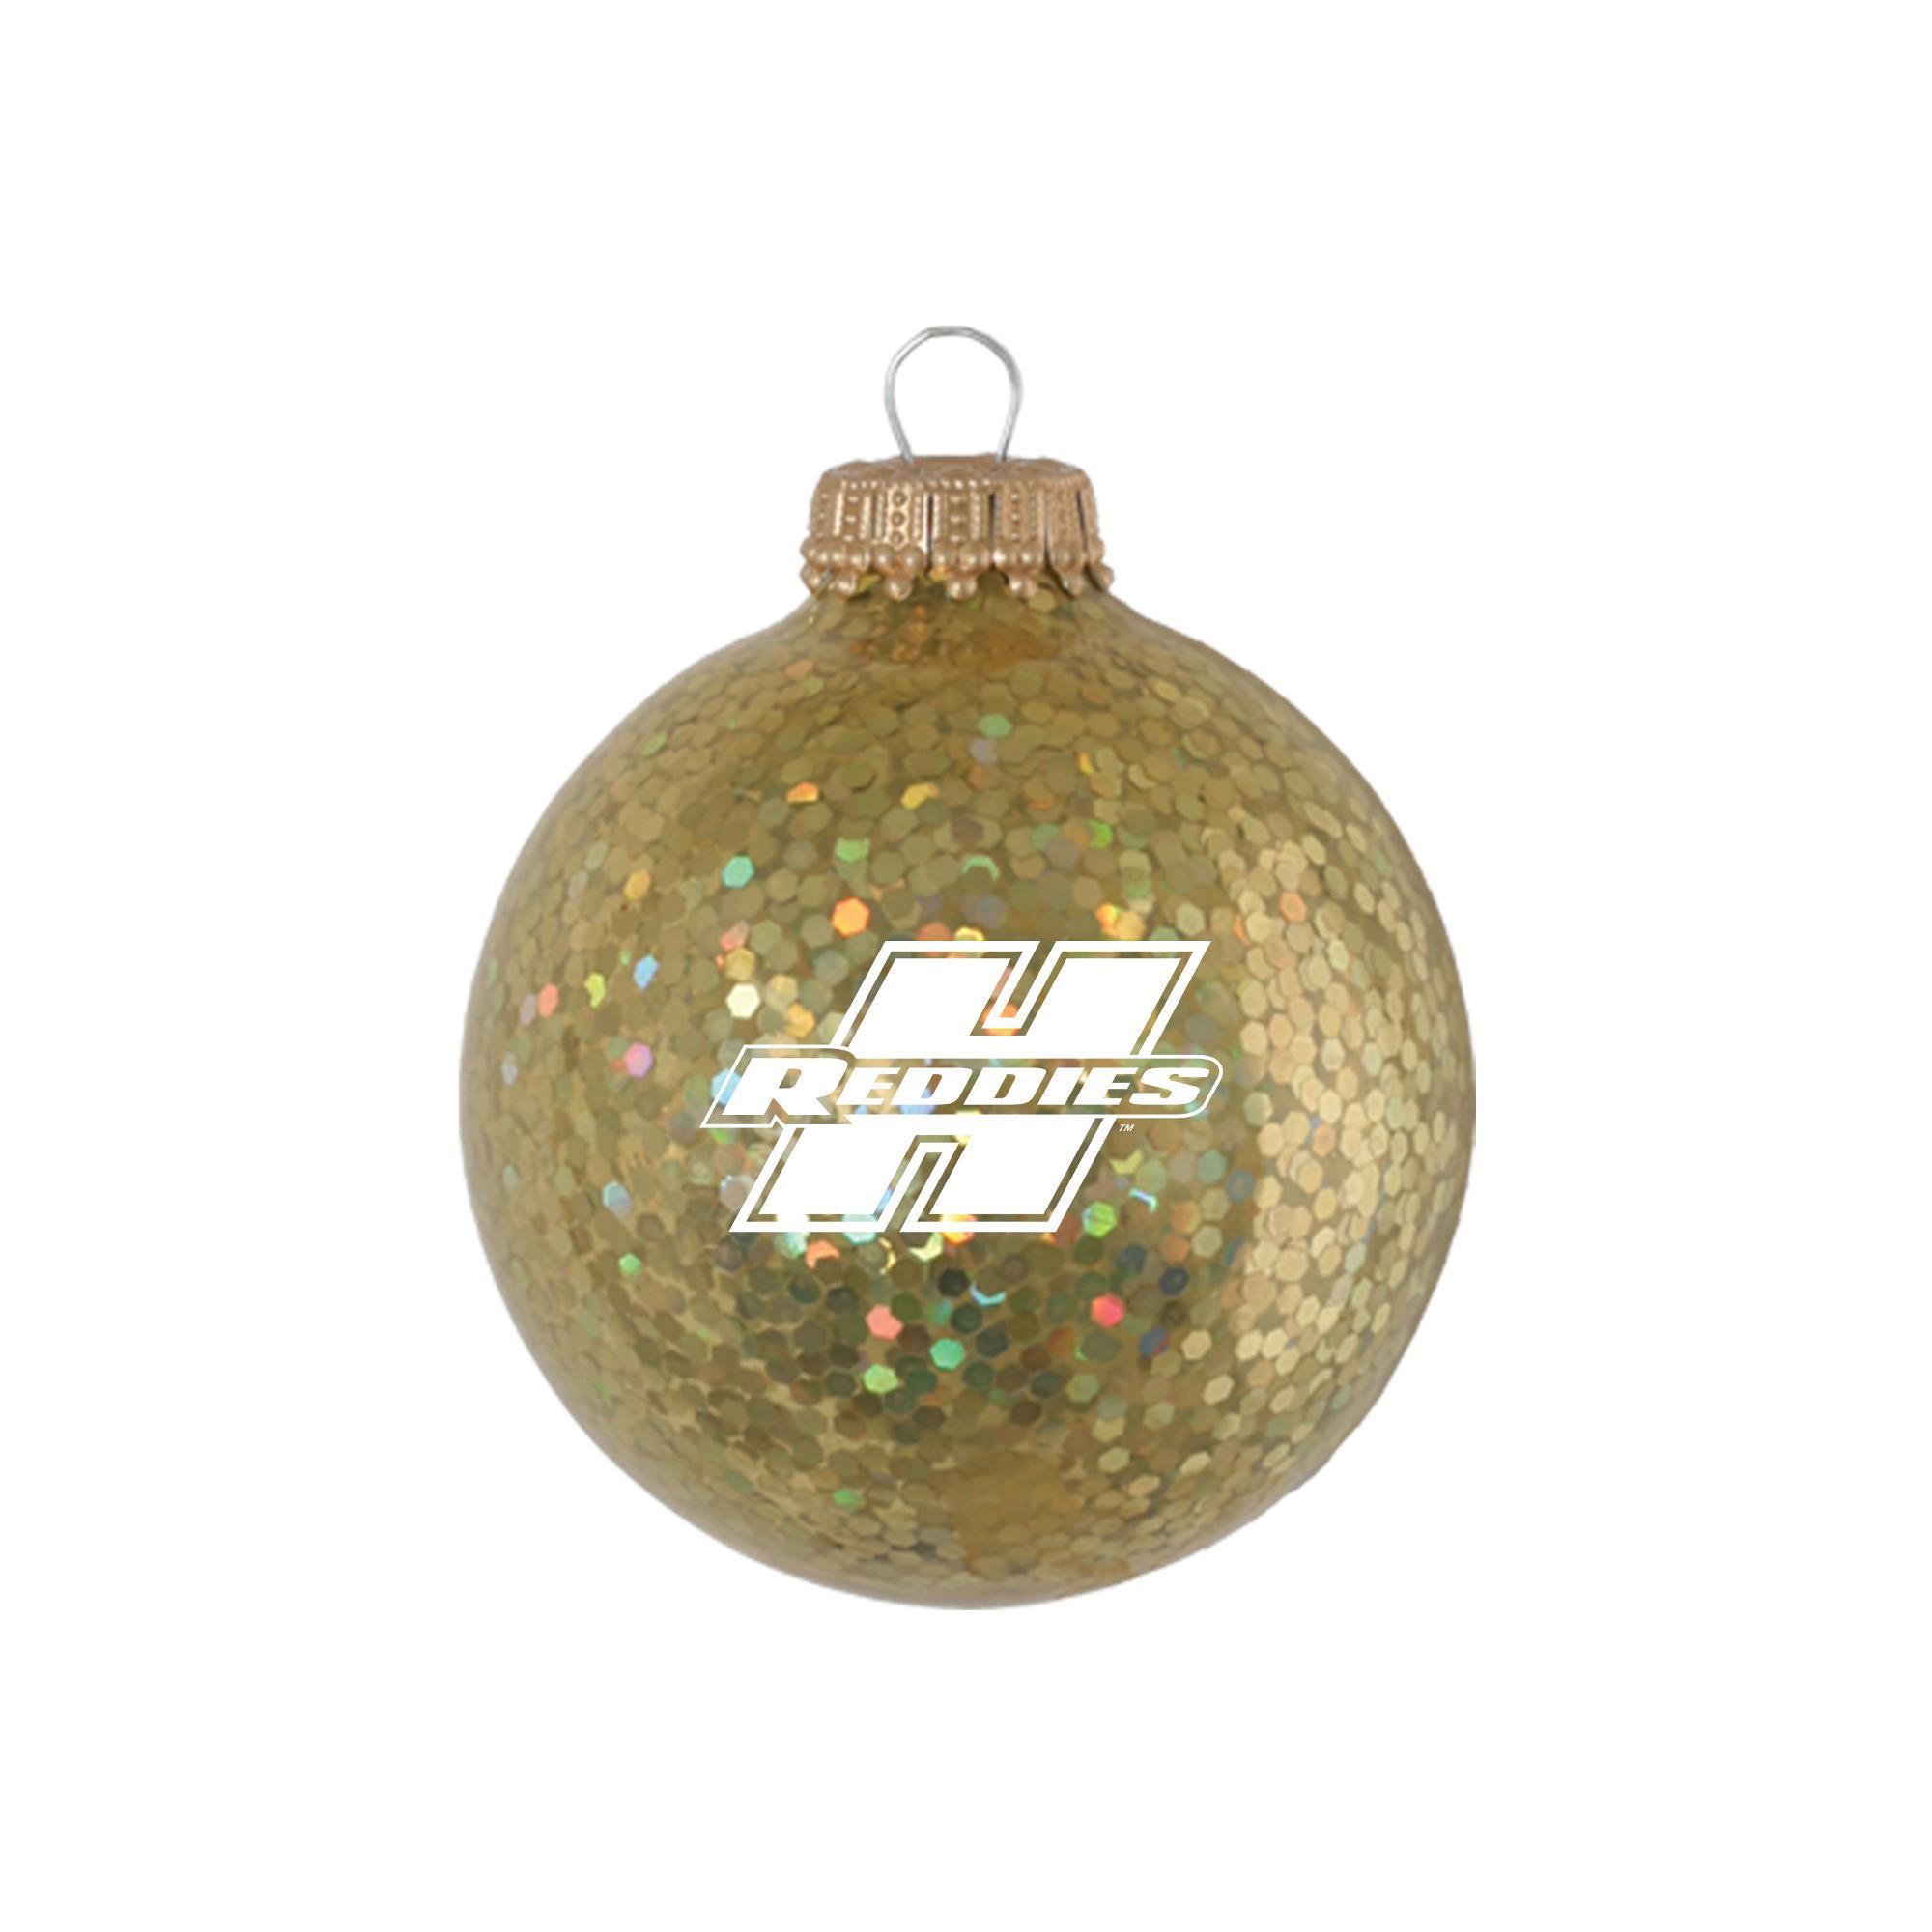 image of: Henderson Reddies Sparkle Ornament